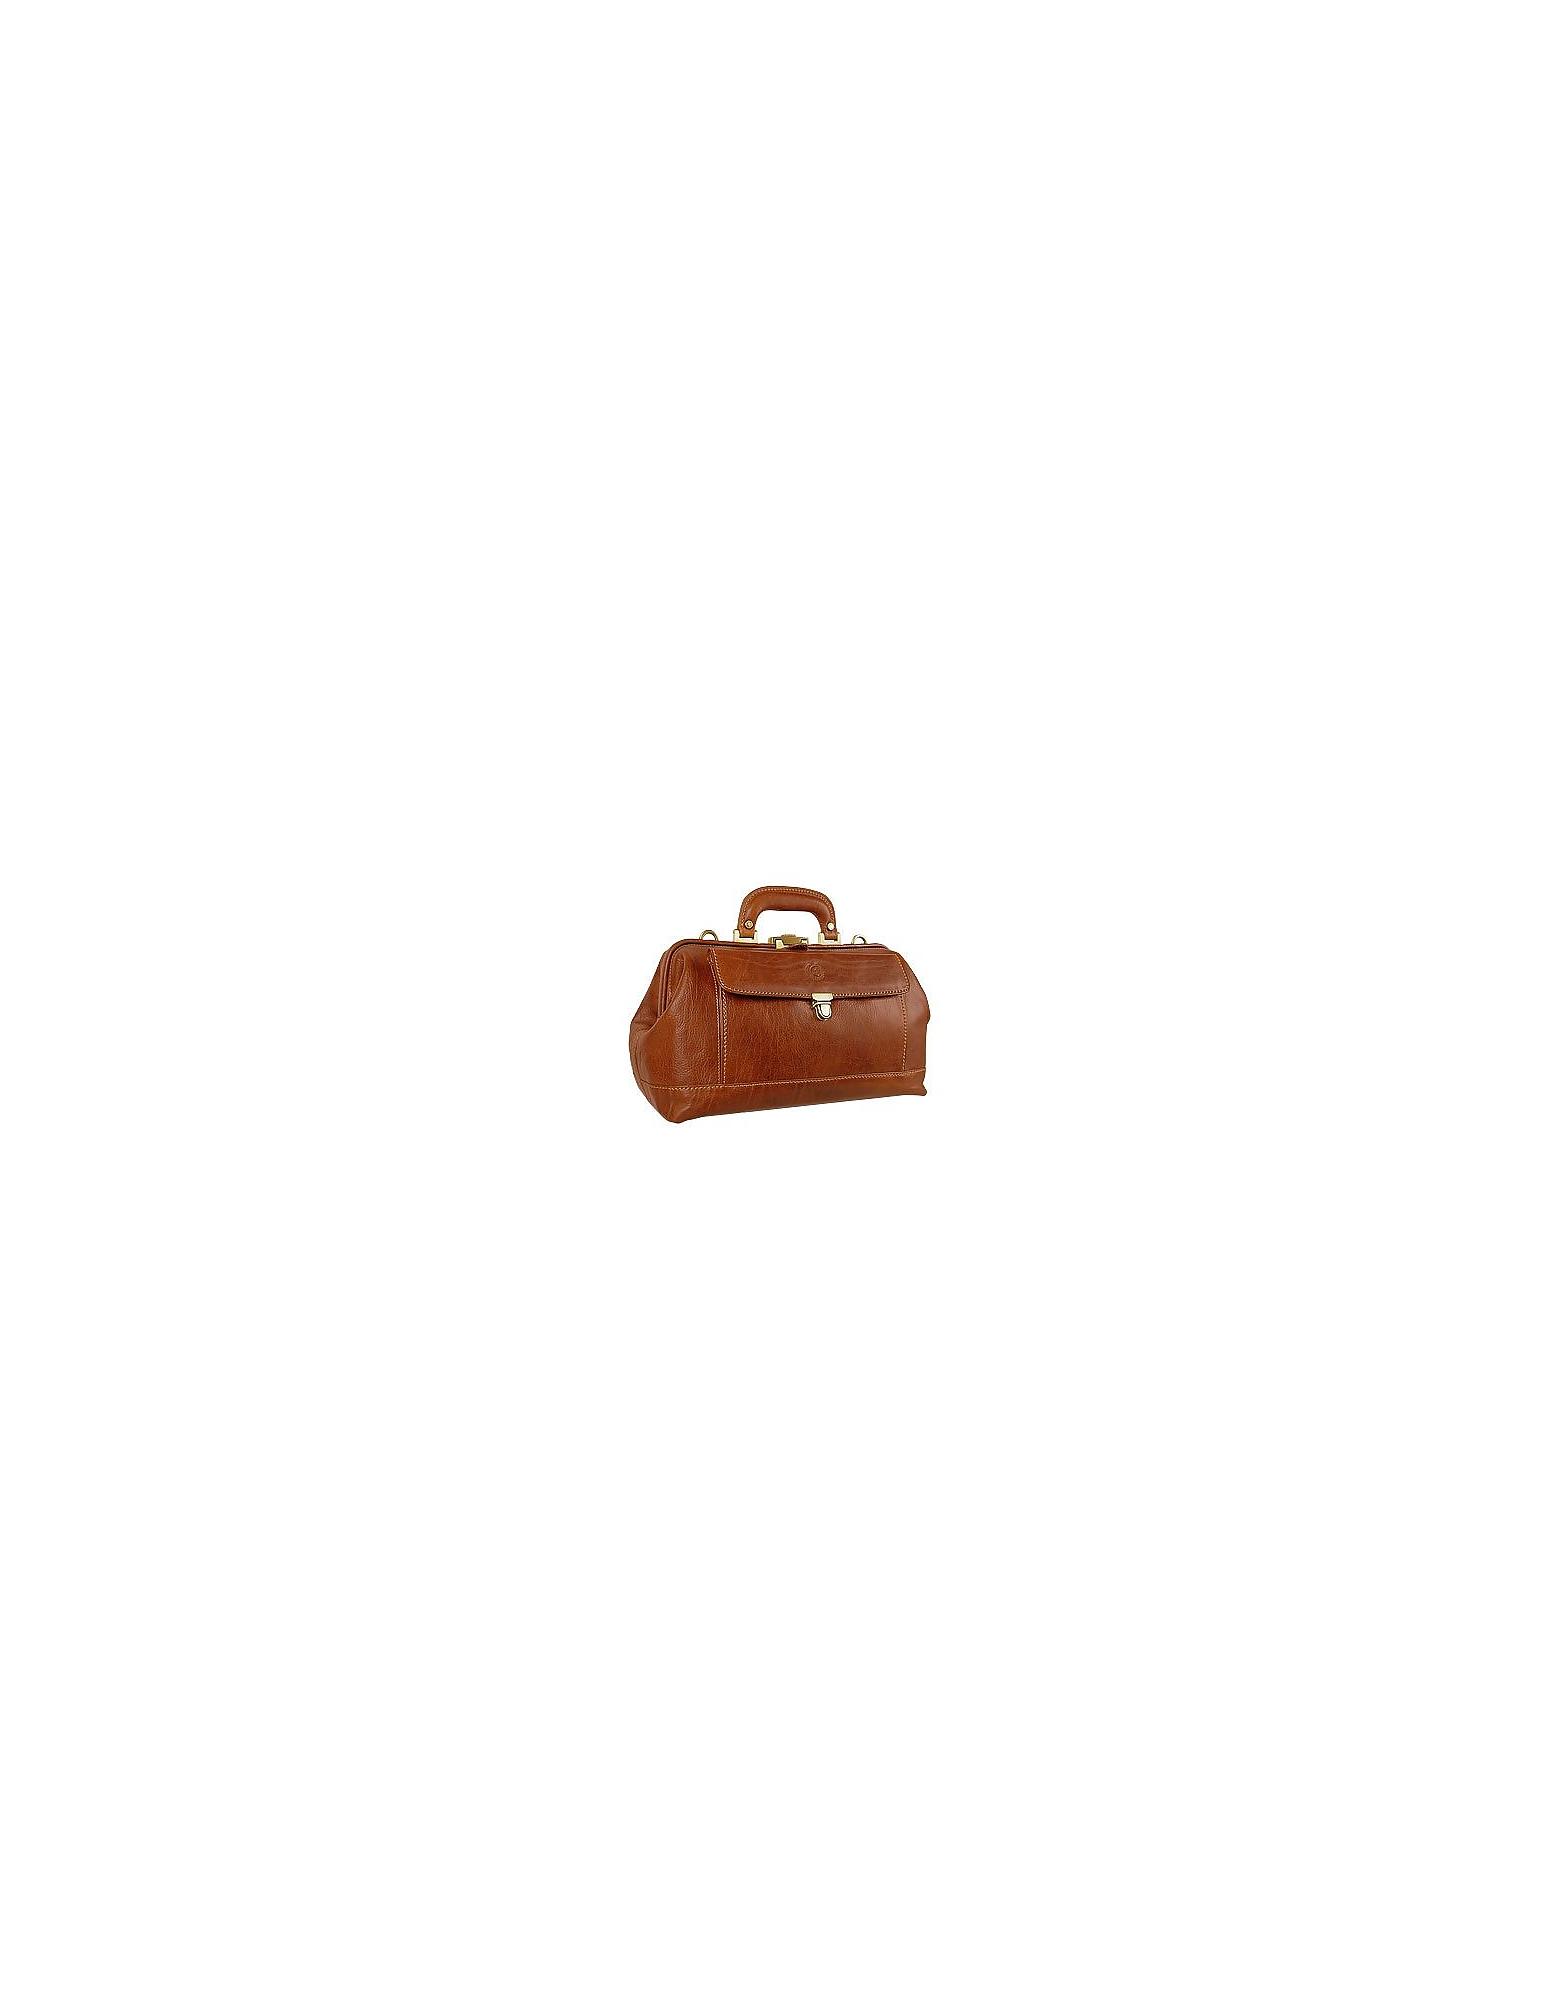 Chiarugi Designer Briefcases,  Genuine Italian Leather Doctor Bag